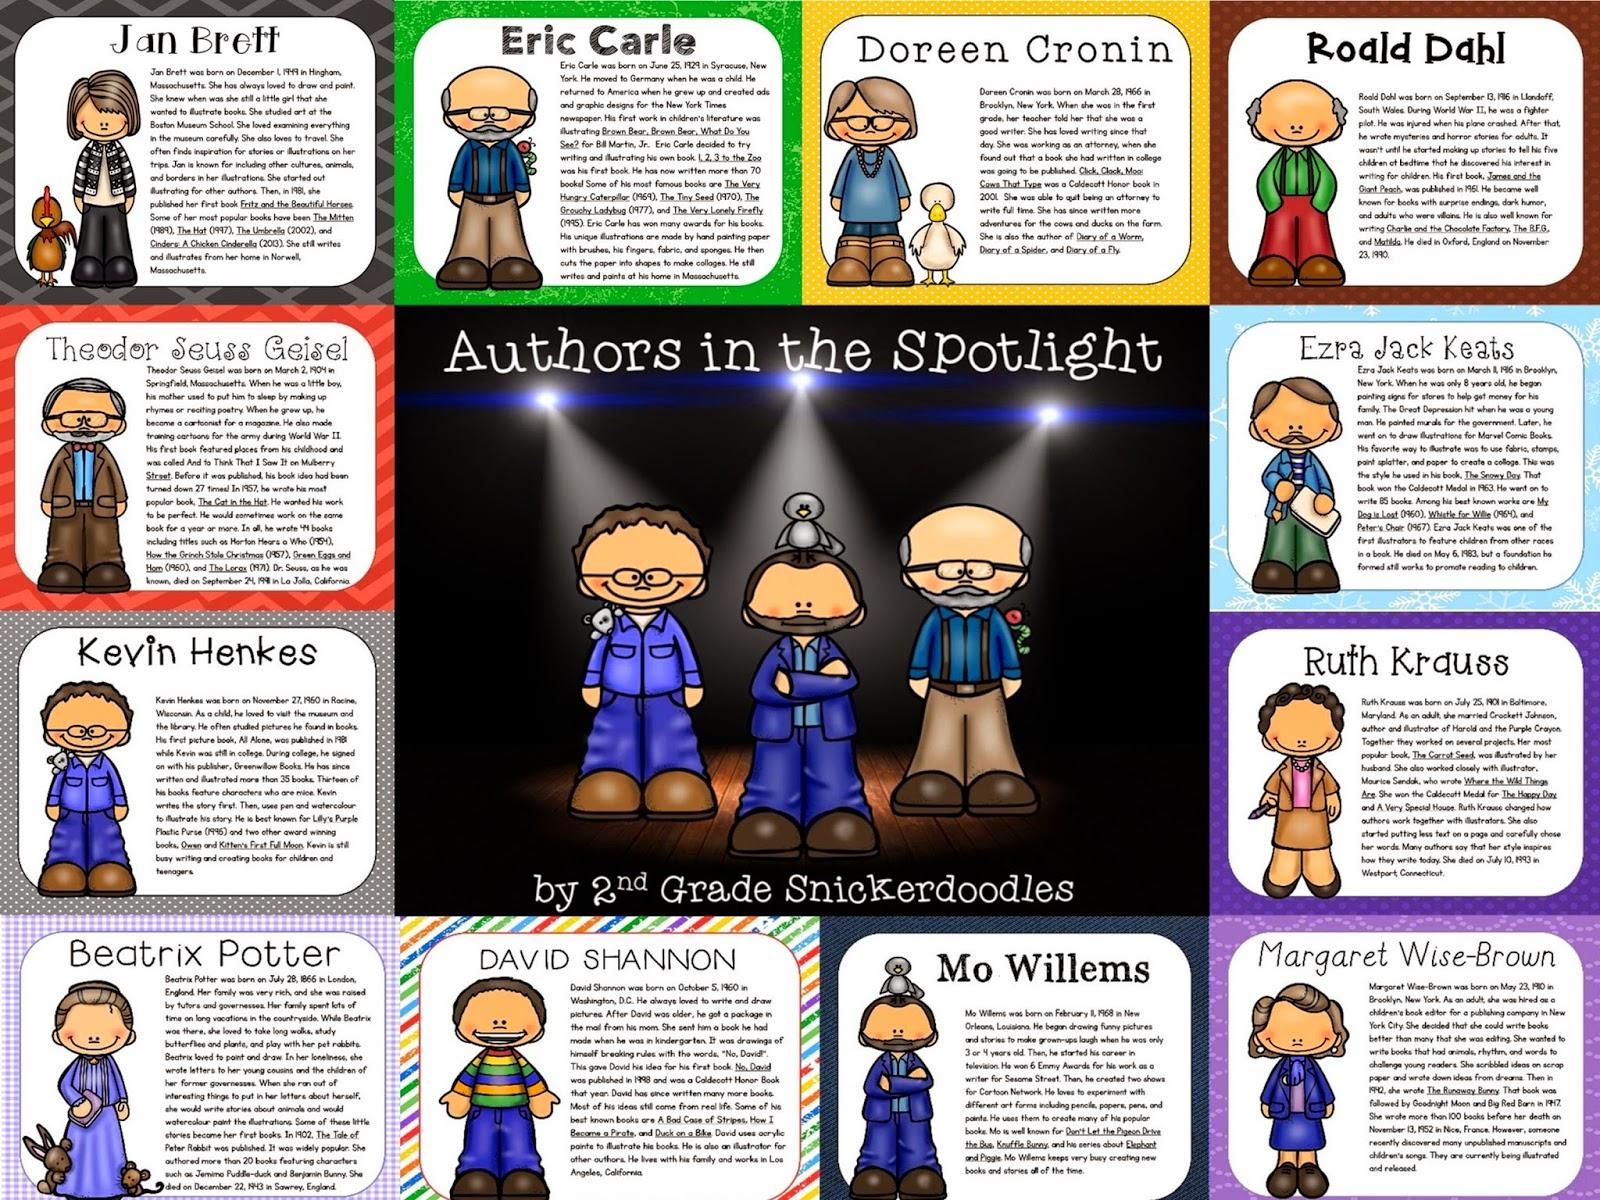 3rd Grade Author Studies - je012.k12.sd.us